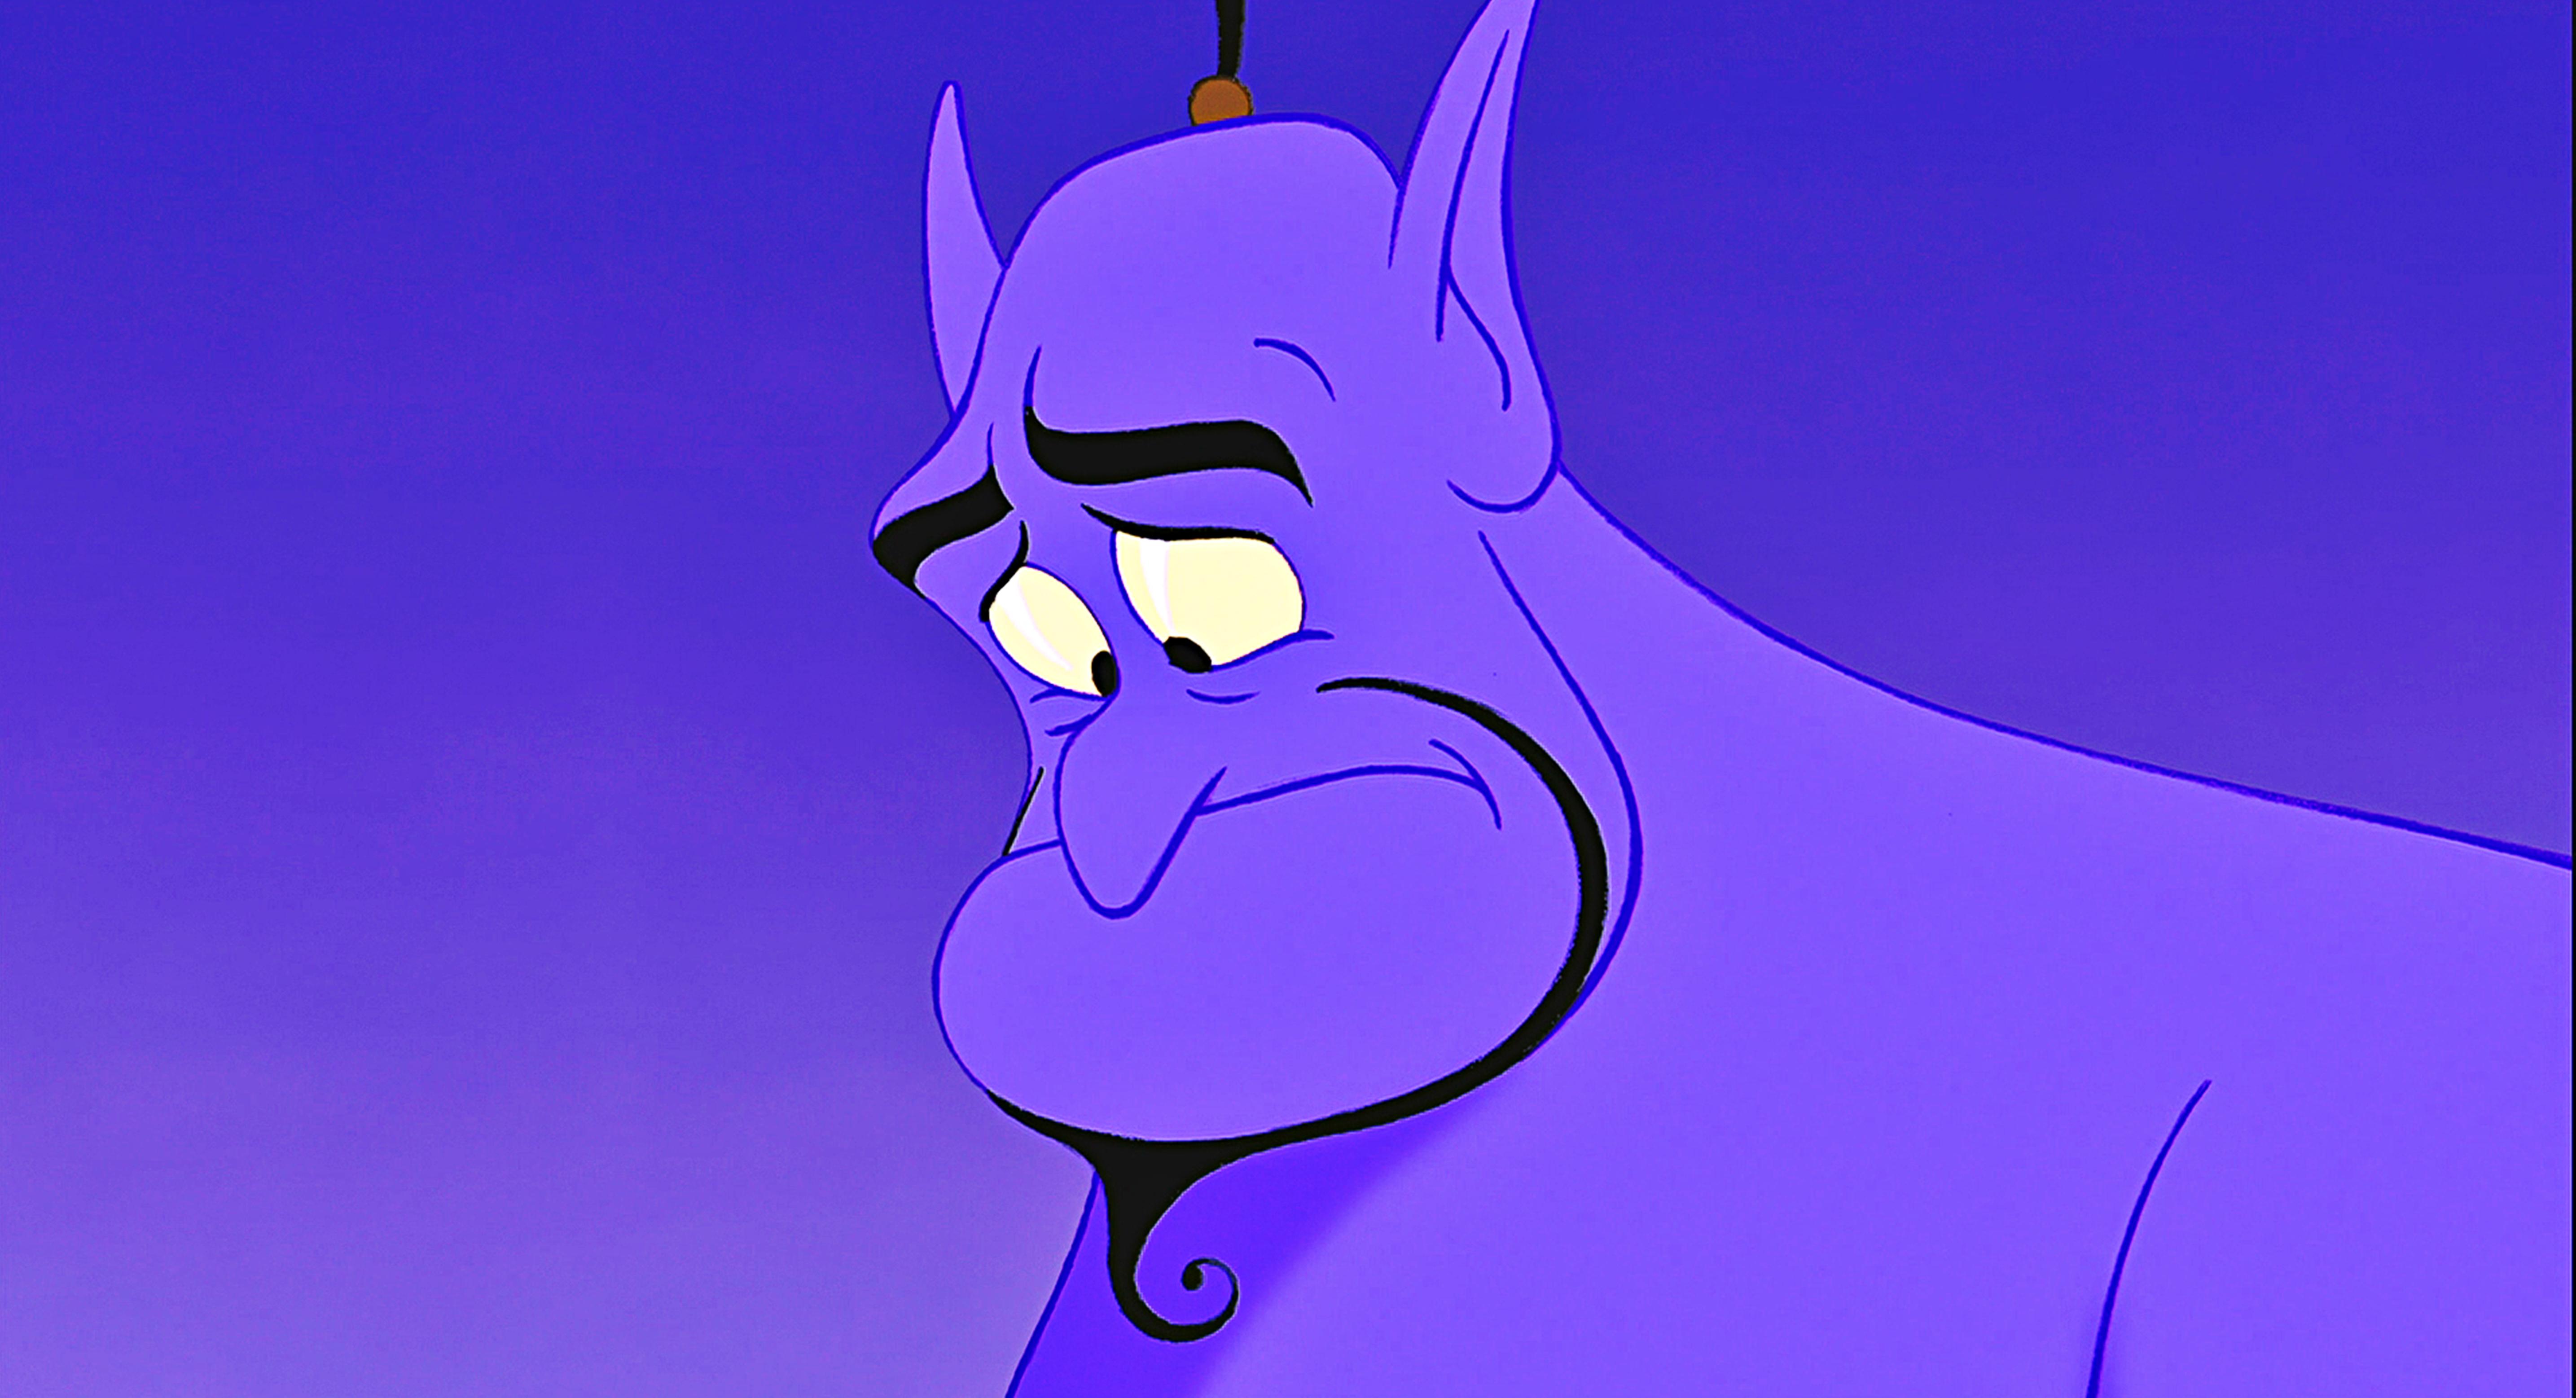 Walt Disney Screencaps - Genie - Walt Disney Characters Photo (37135930) - Fanpop